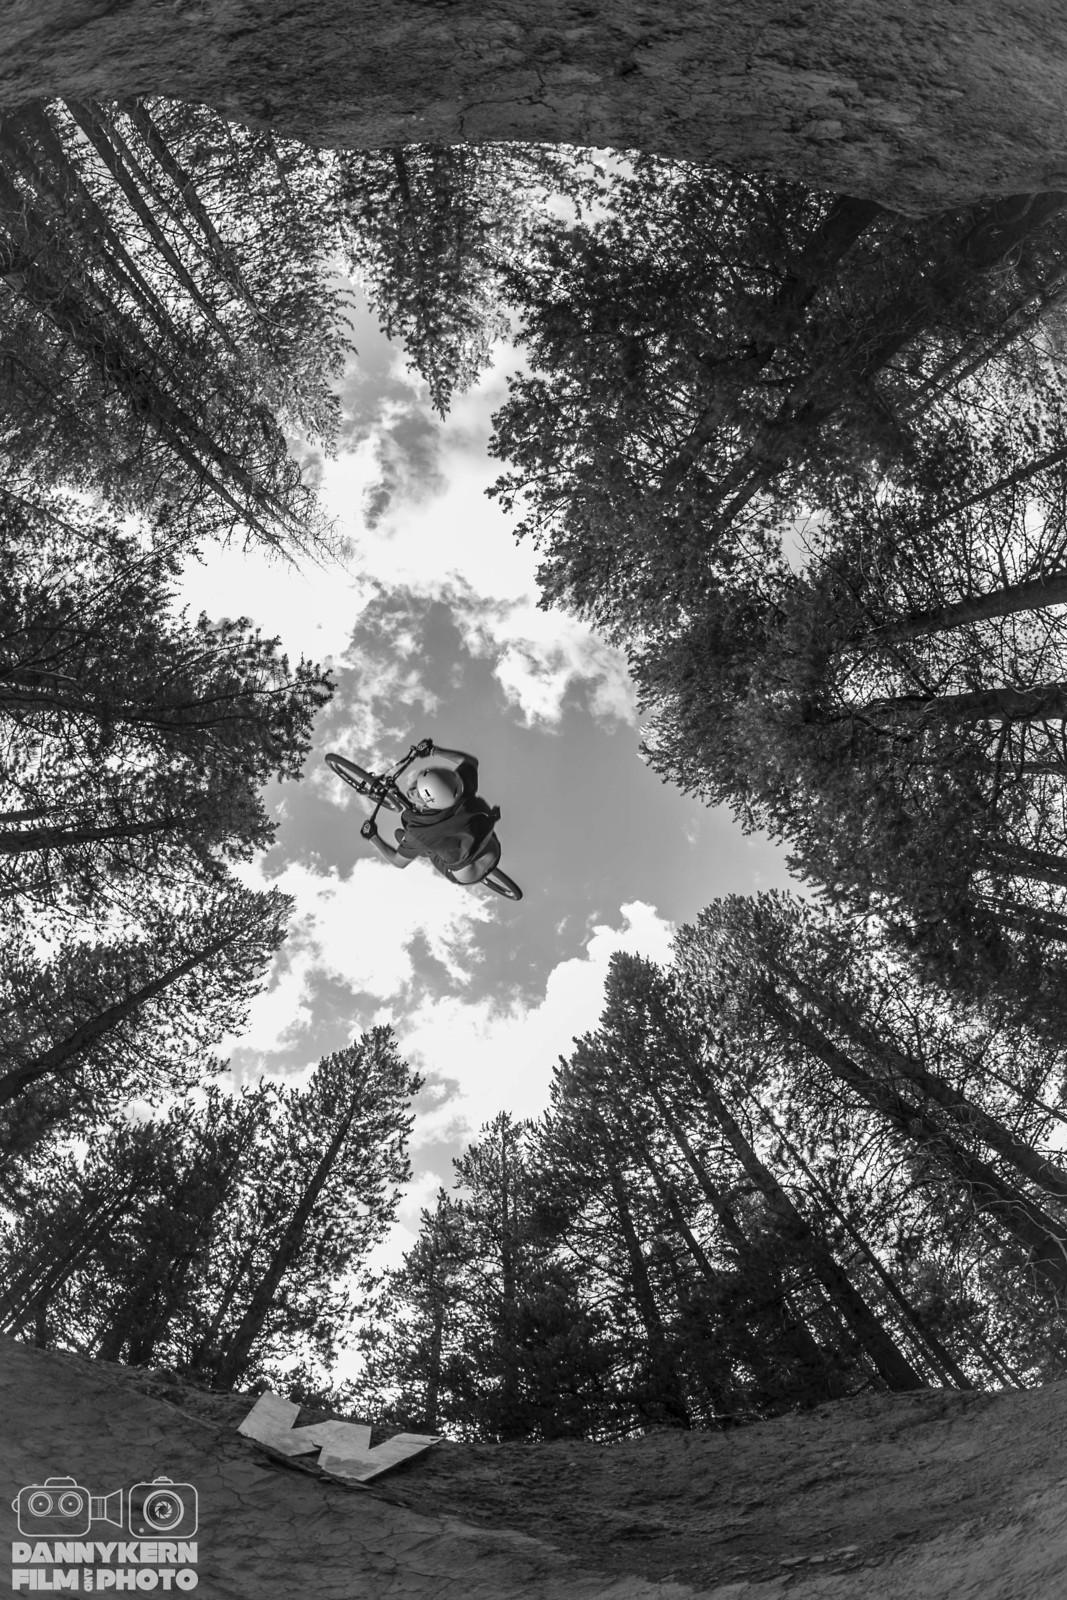 Sky Flip - Christian - Mountain Biking Pictures - Vital MTB